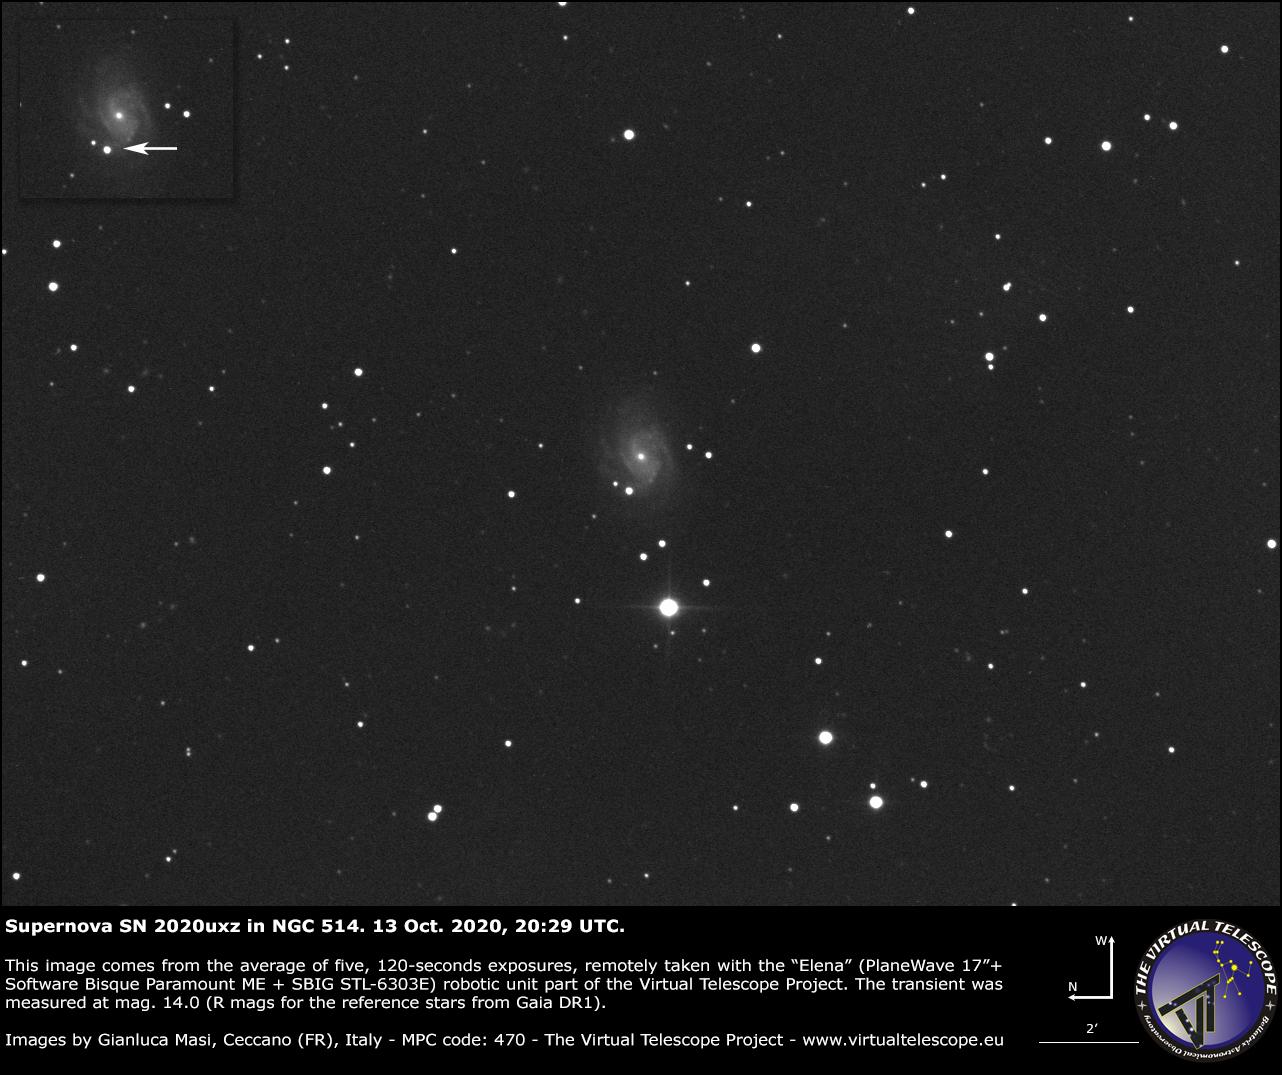 NGC 514 and supernova SN 2020uxz: 13 Oct. 2020.